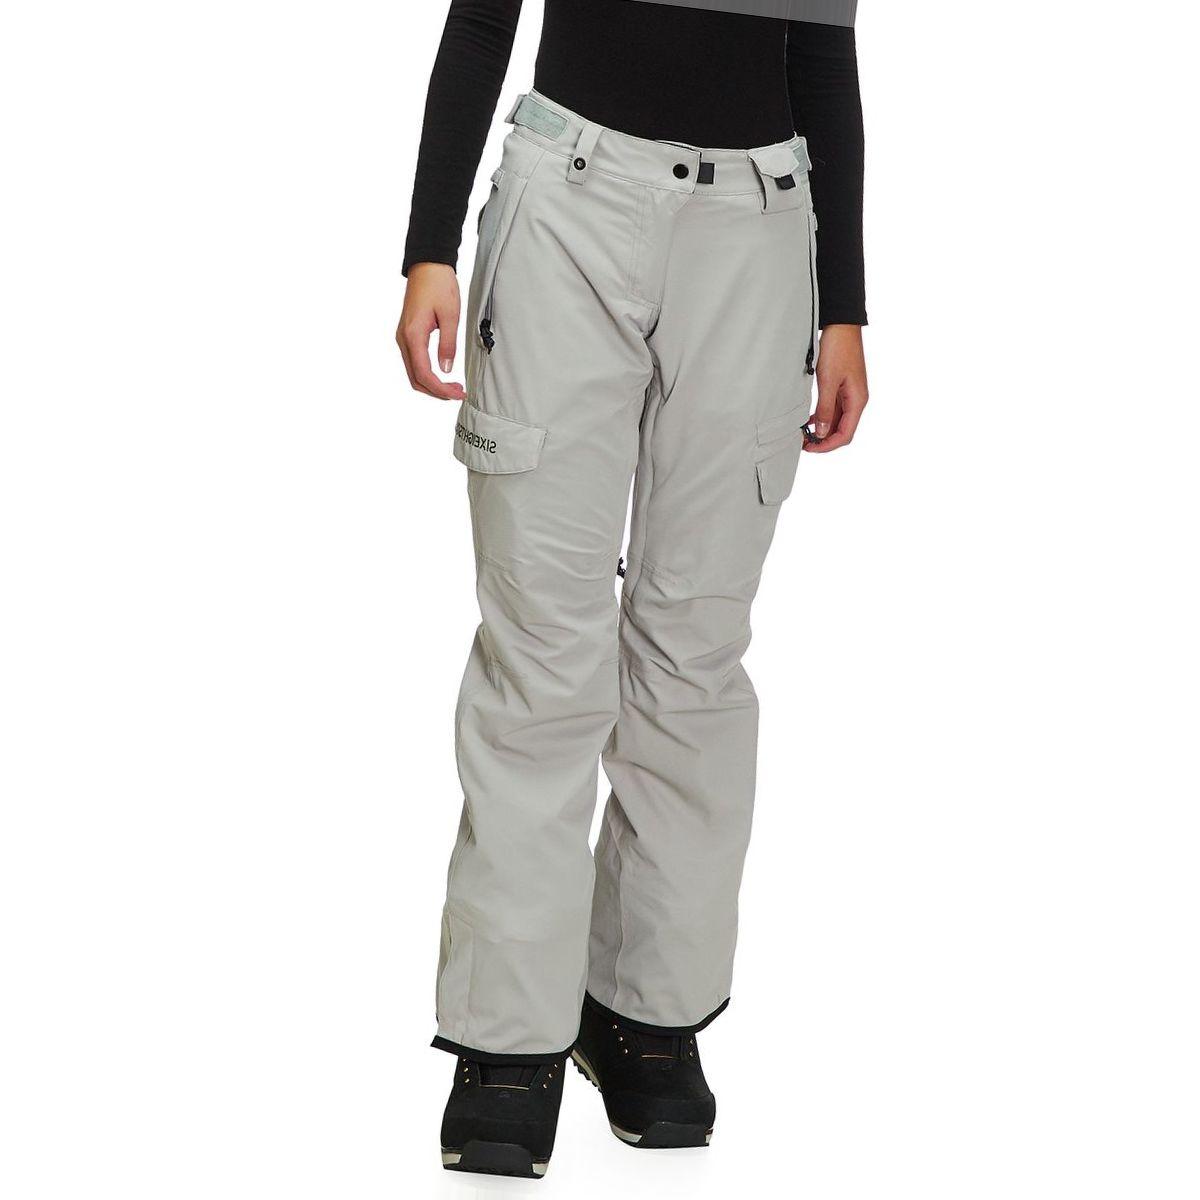 686 Smarty 3-in-1 Cargo Pant - Women's